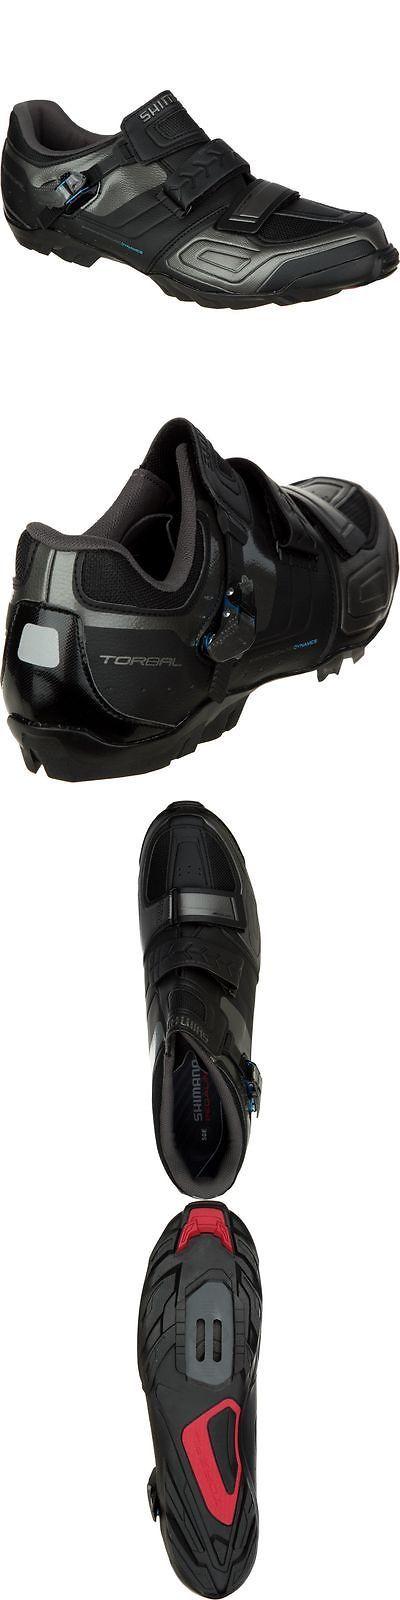 Men 158986: Shimano Sh-M089 Cycling Shoe - Wide - Men S -> BUY IT NOW ONLY: $83.96 on eBay!